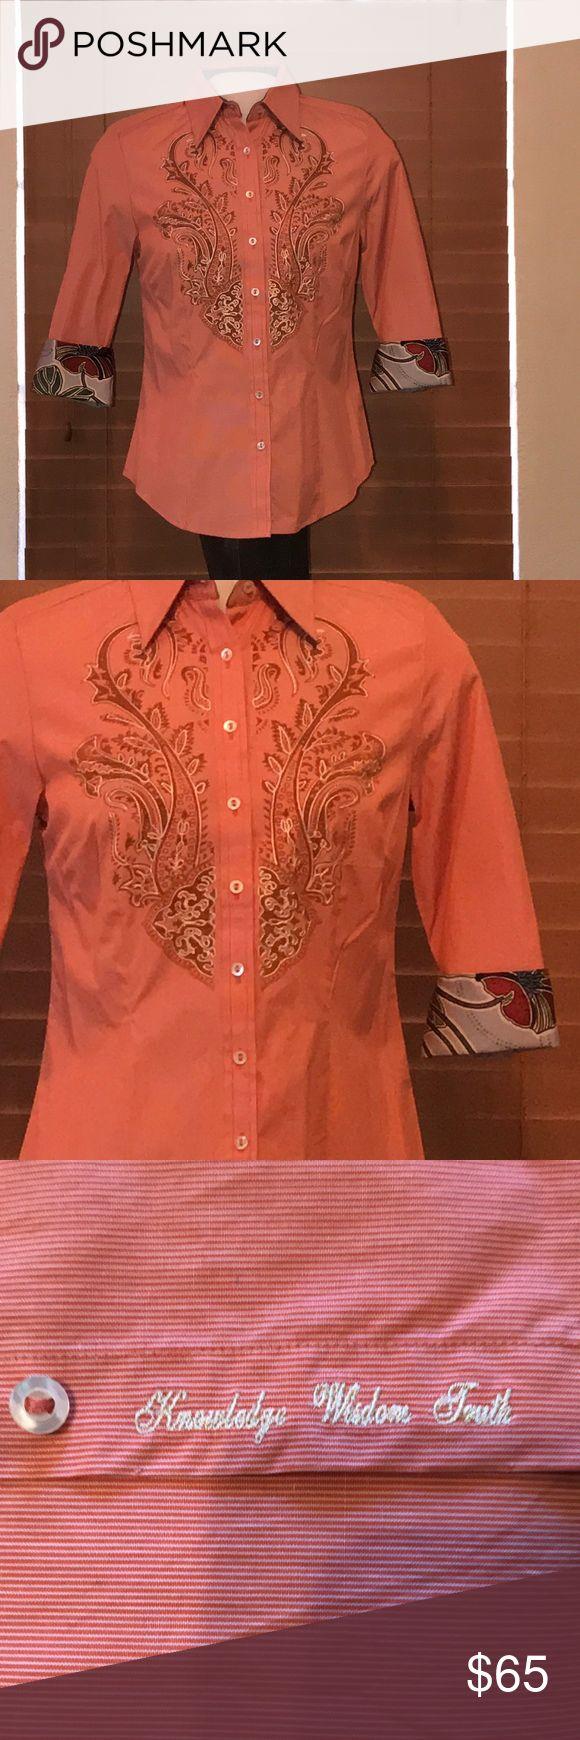 Robert Graham Blouse Beautiful Robert Graham blouse. Robert Graham Tops Button Down Shirts